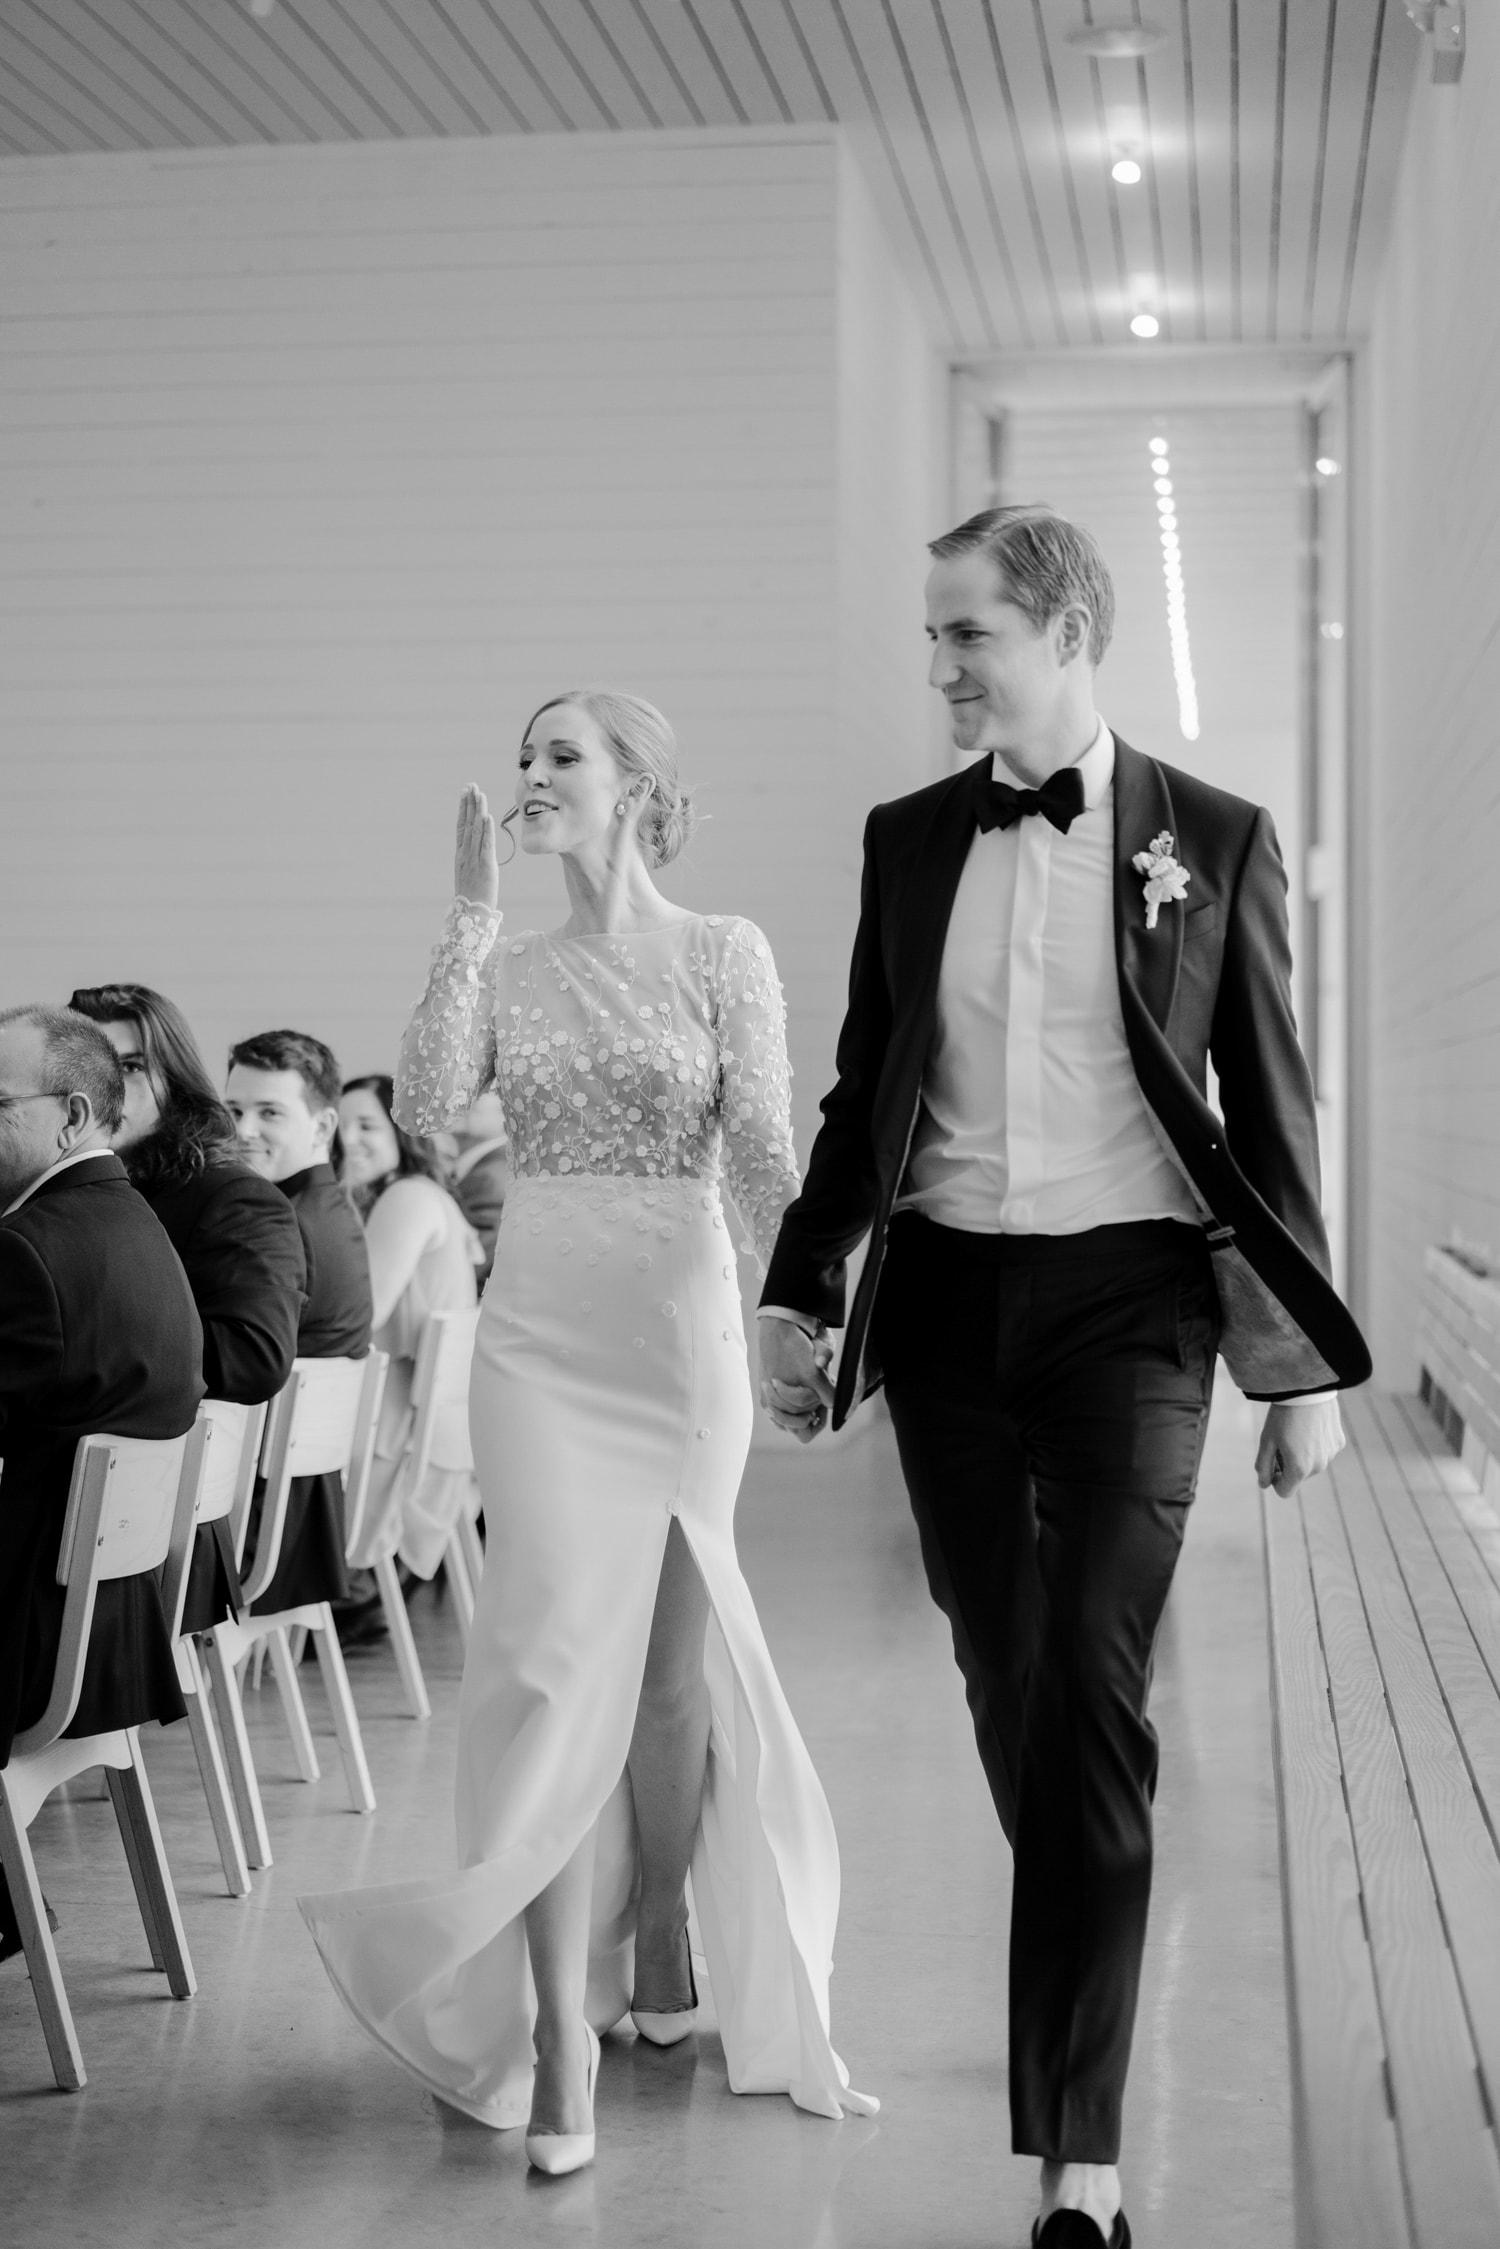 prospect-house-wedding-59.jpg